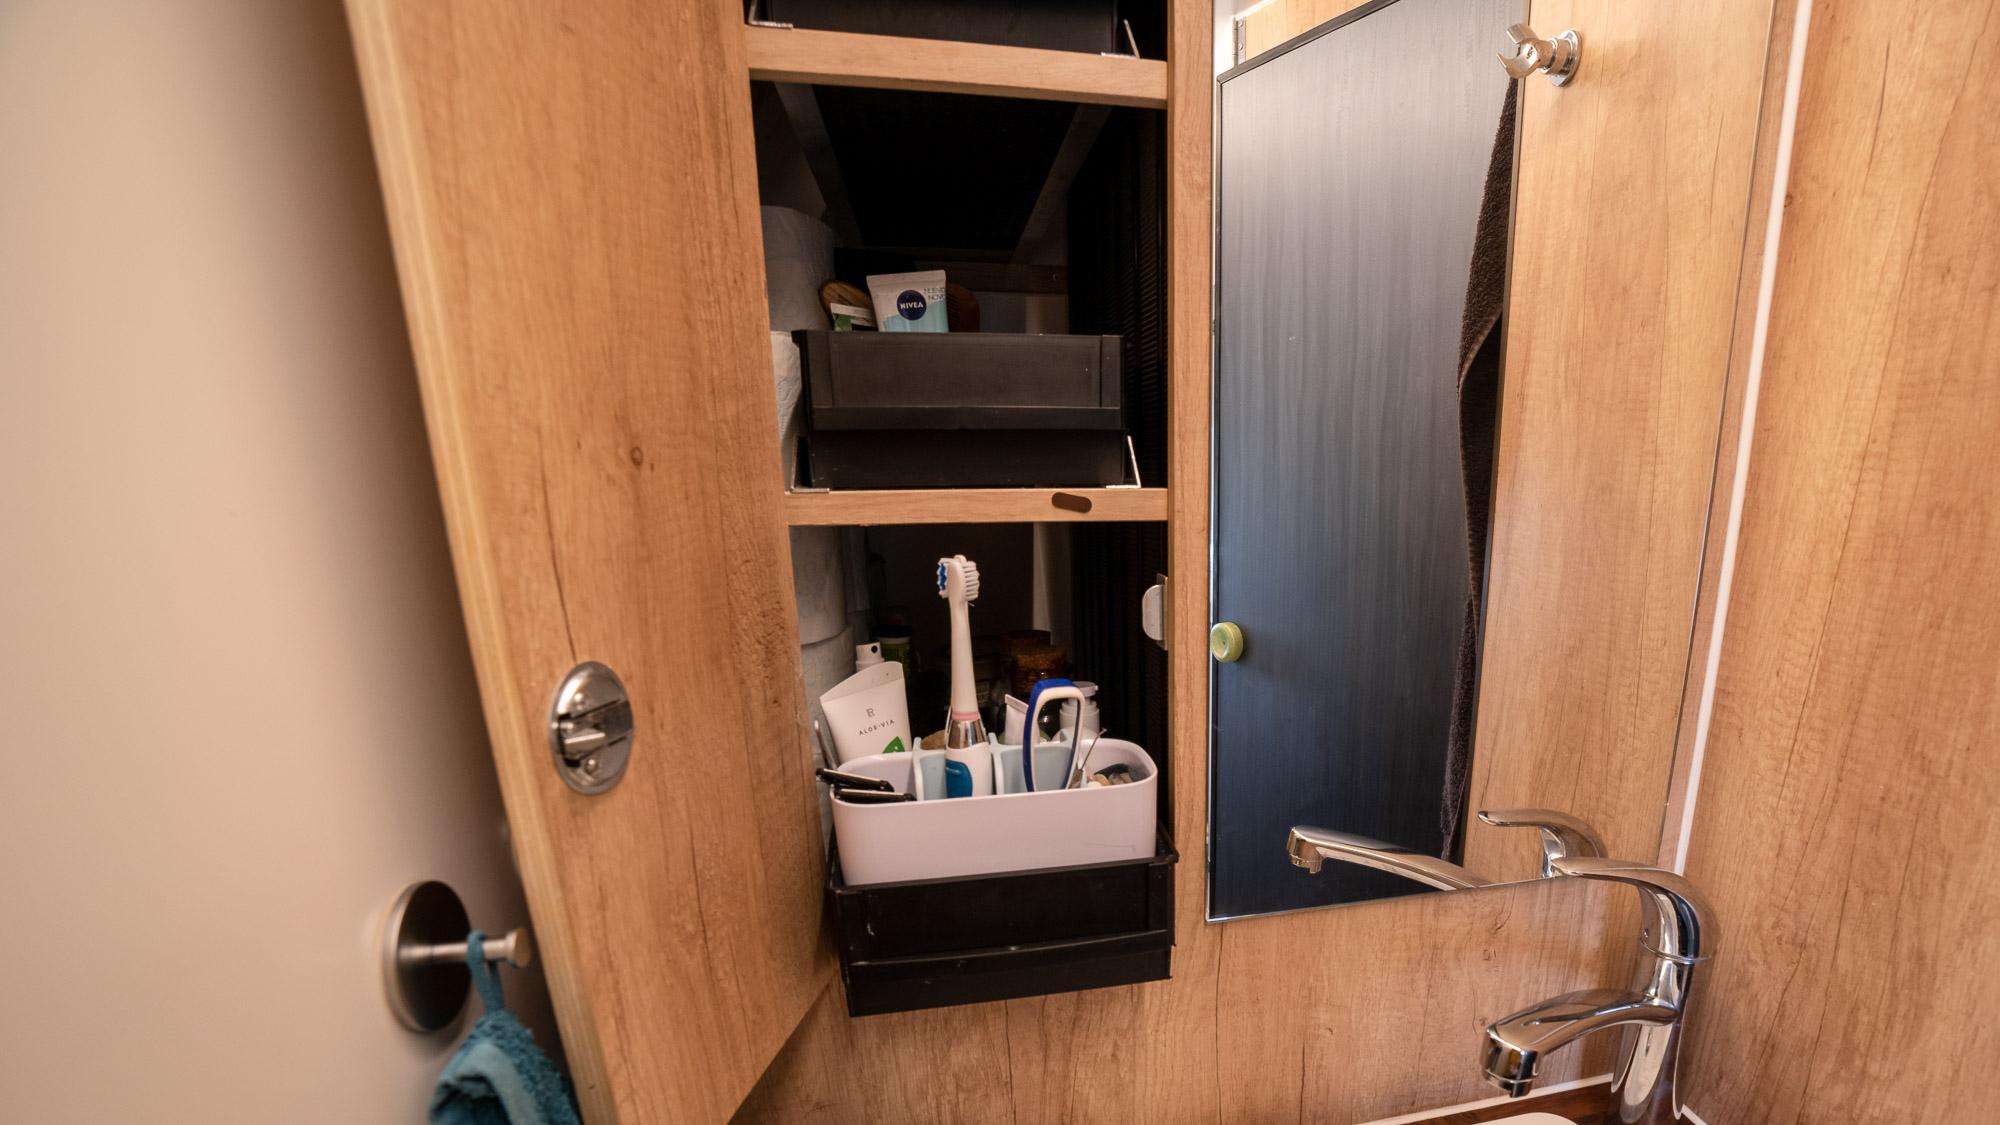 Badschrank im Wohnmobil